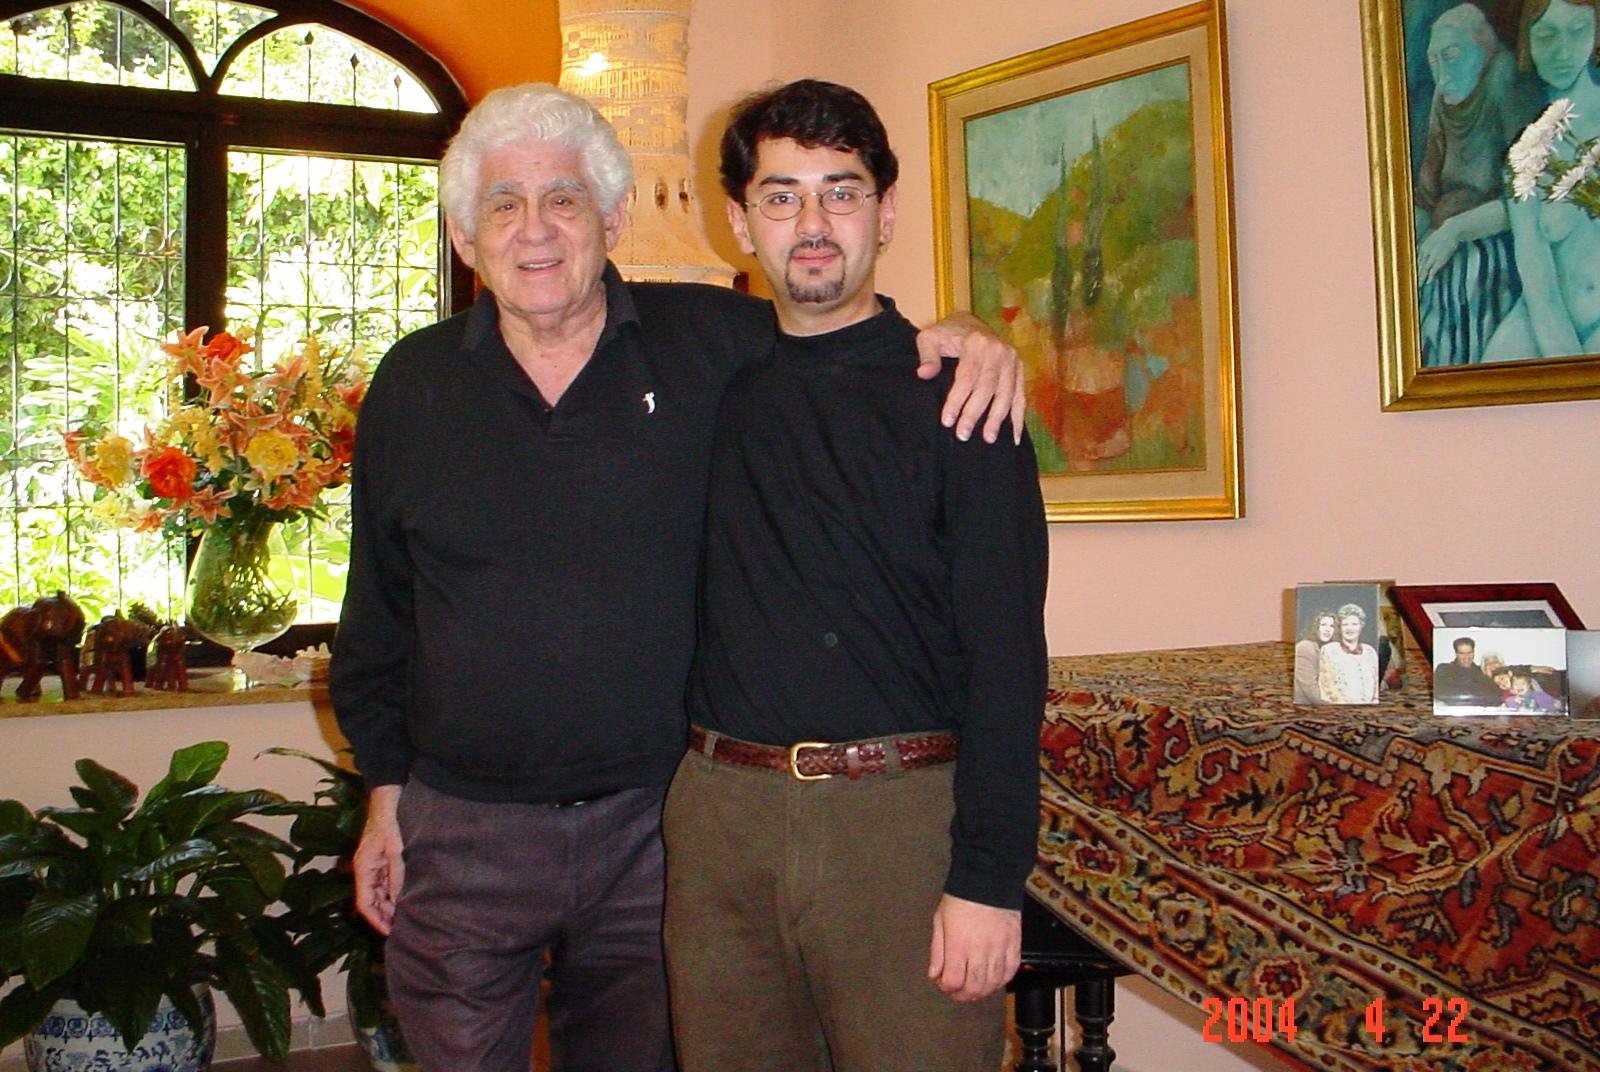 With the legend, Chaim Taub